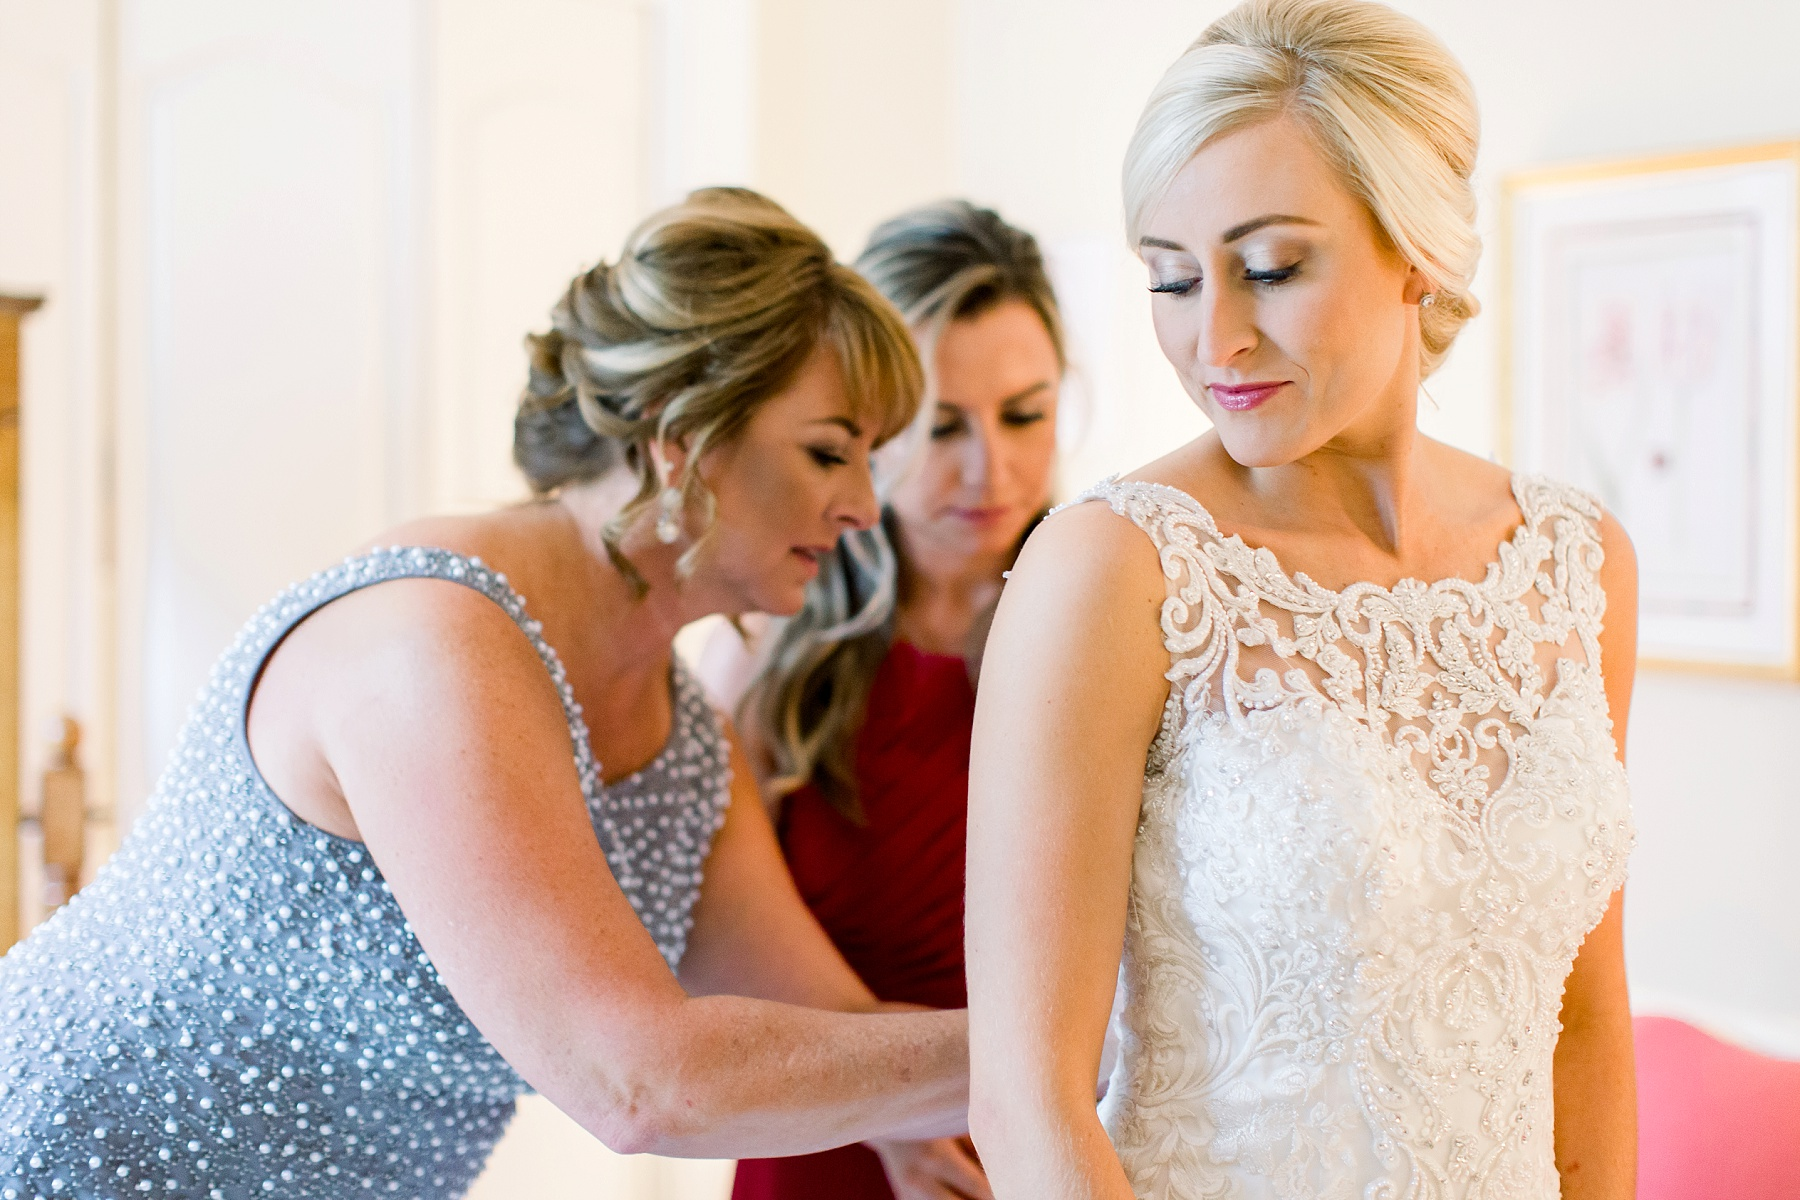 midwest-adventurous-wedding-photographer-elizabeth-ladean-photography-photo_4692.jpg